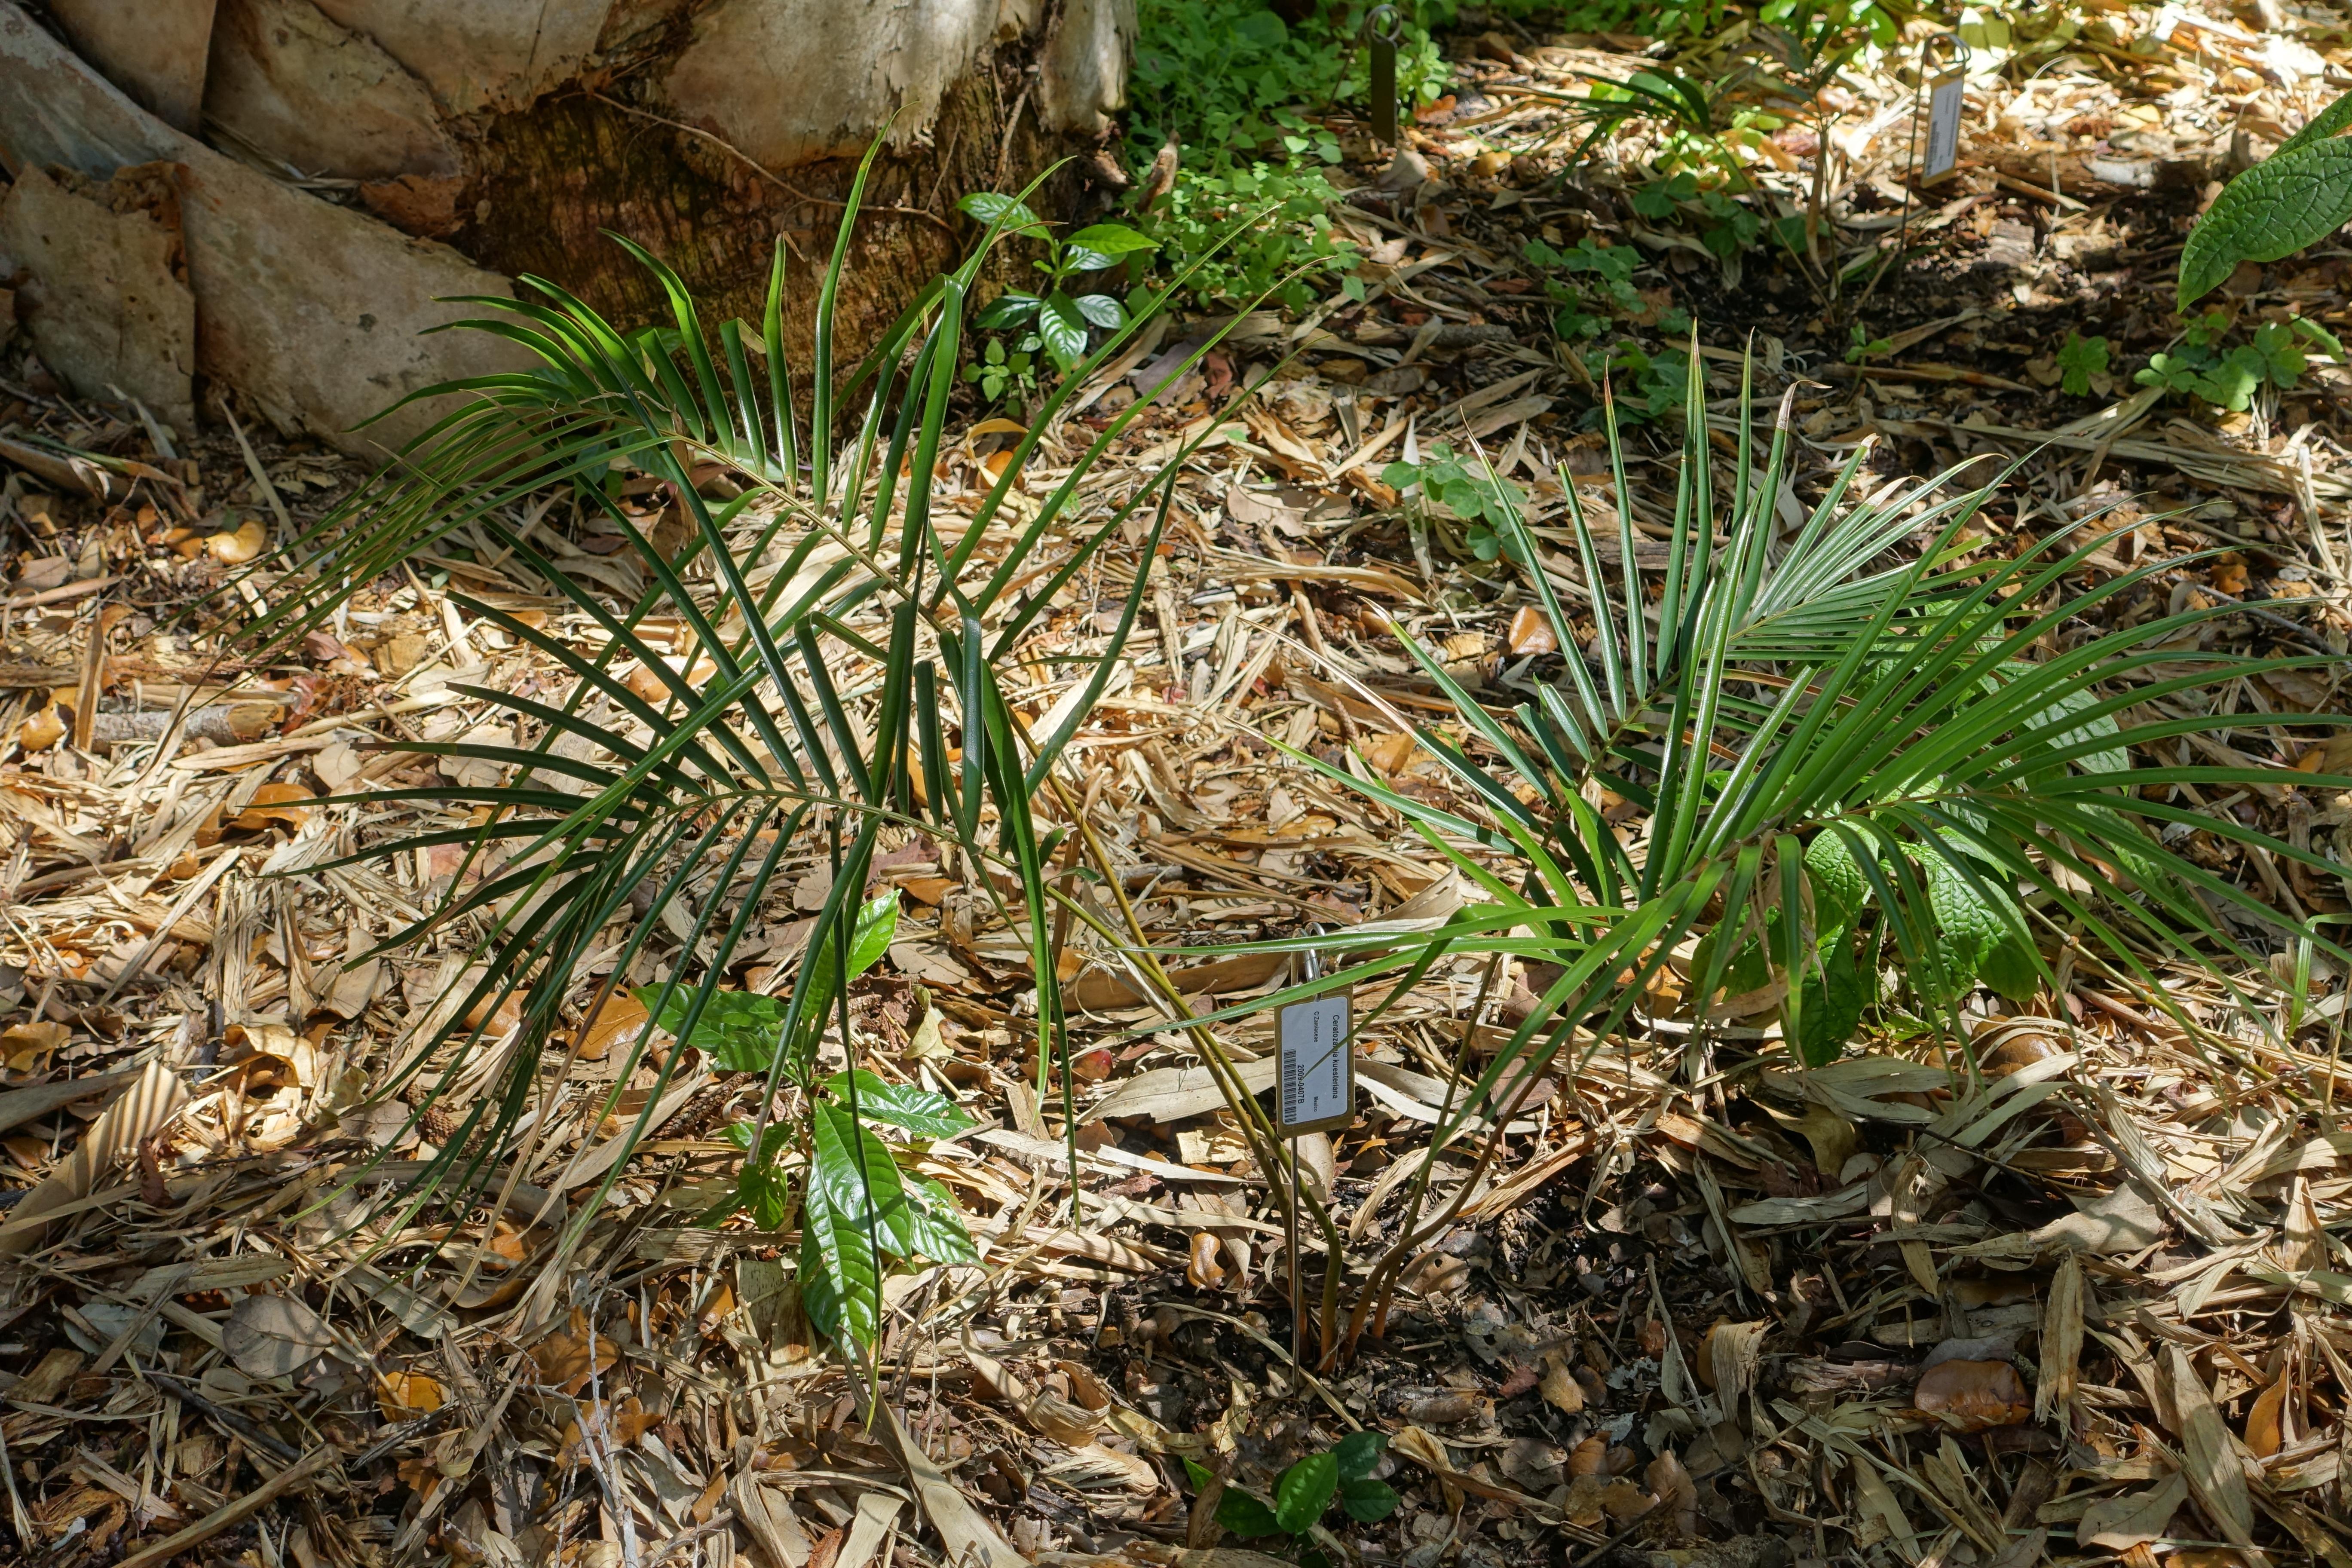 File:Ceratozamia kuesteriana - Marie Selby Botanical Gardens ...